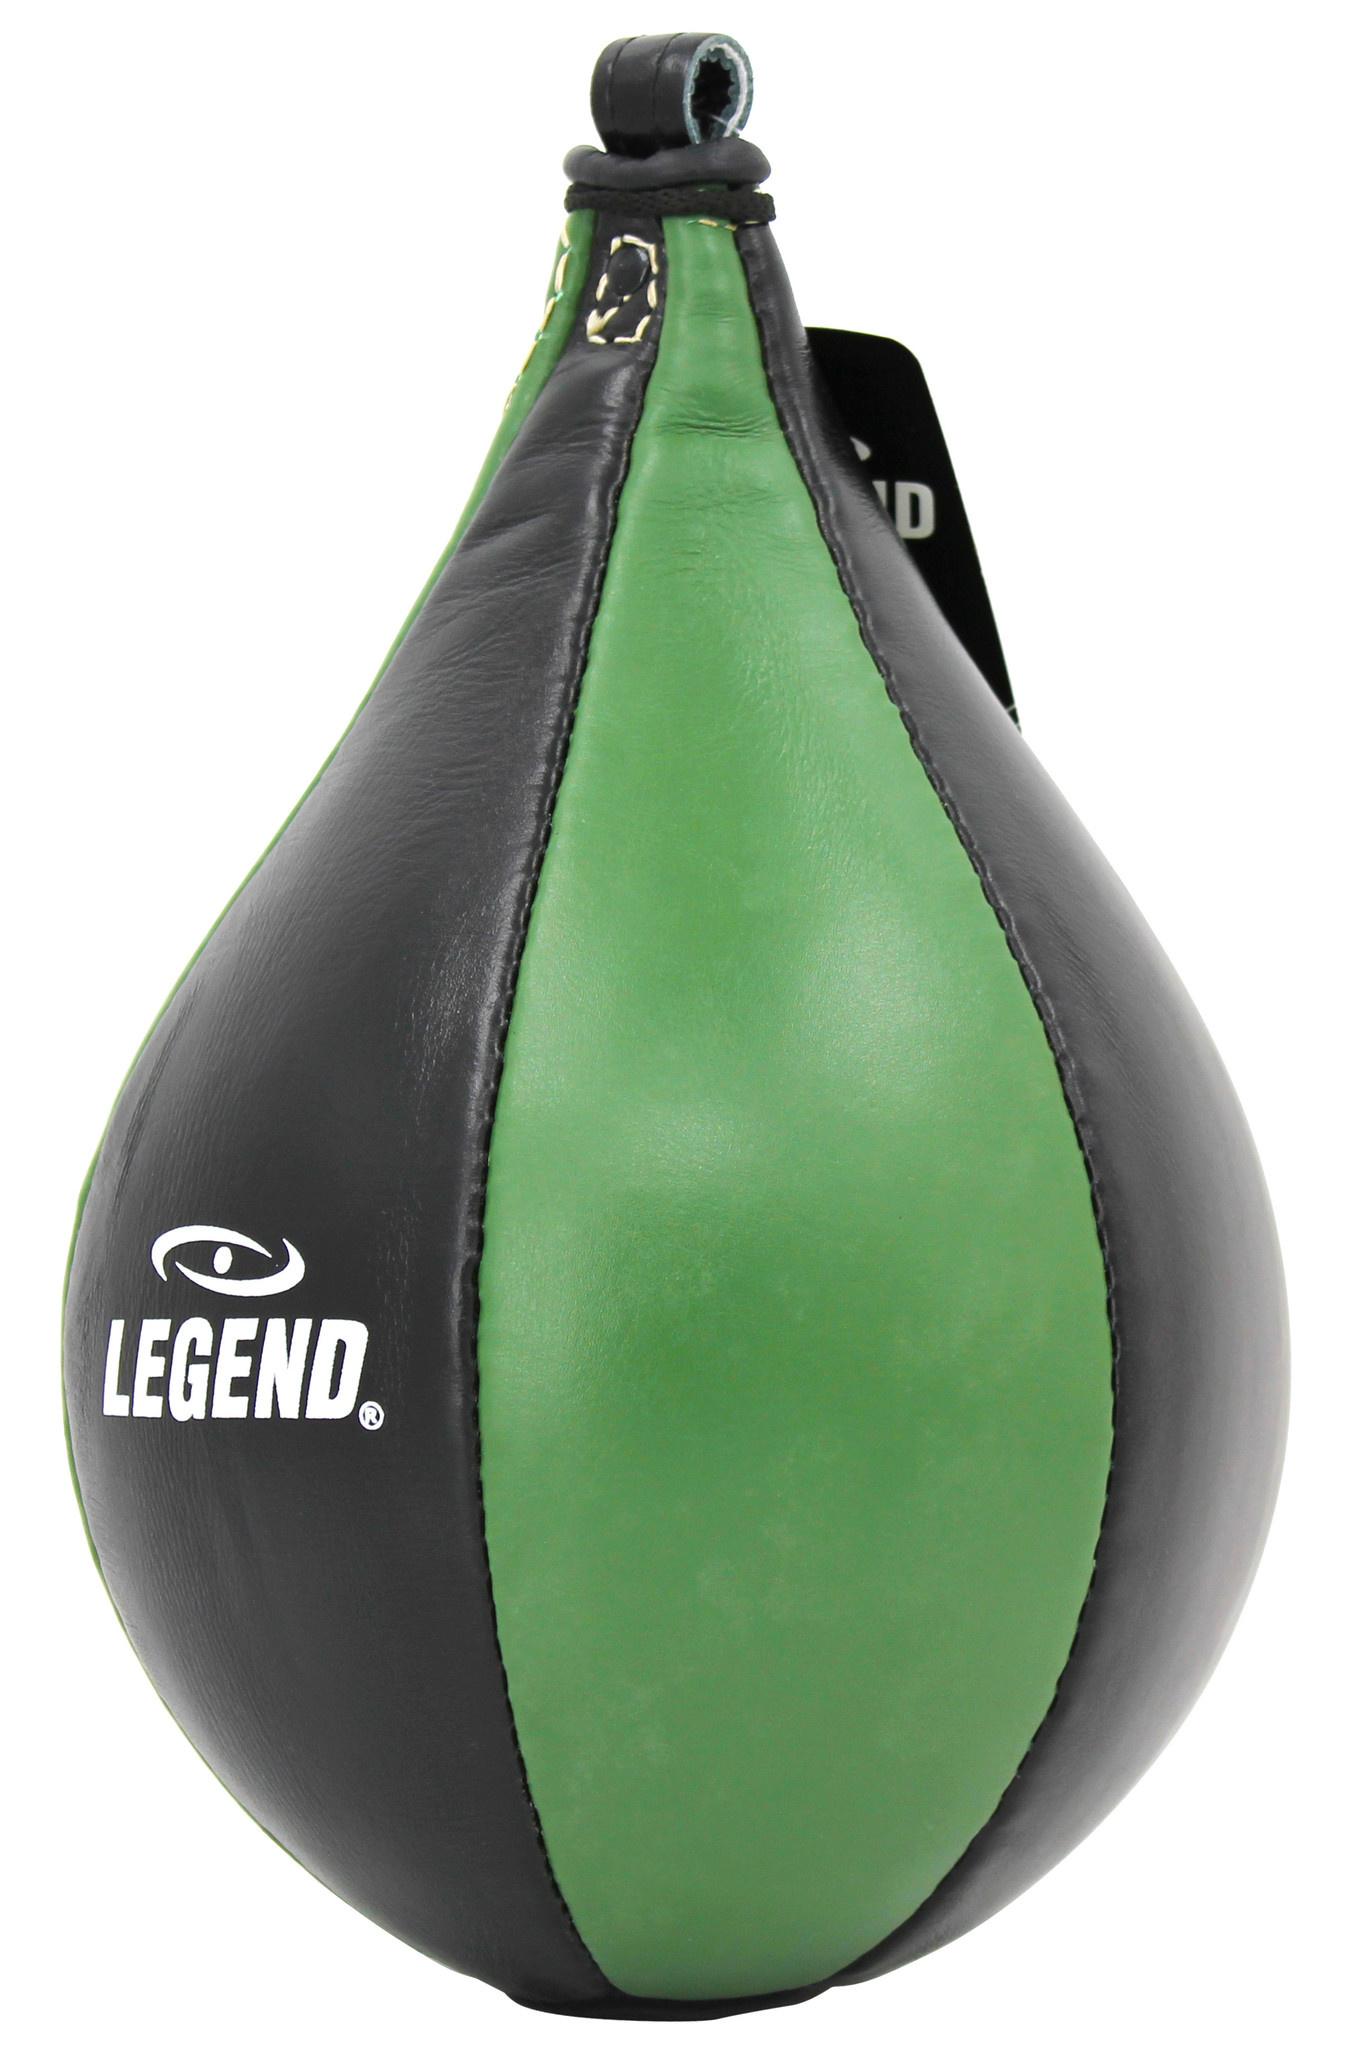 Lederen Boksbal legend speedball Wit of Army